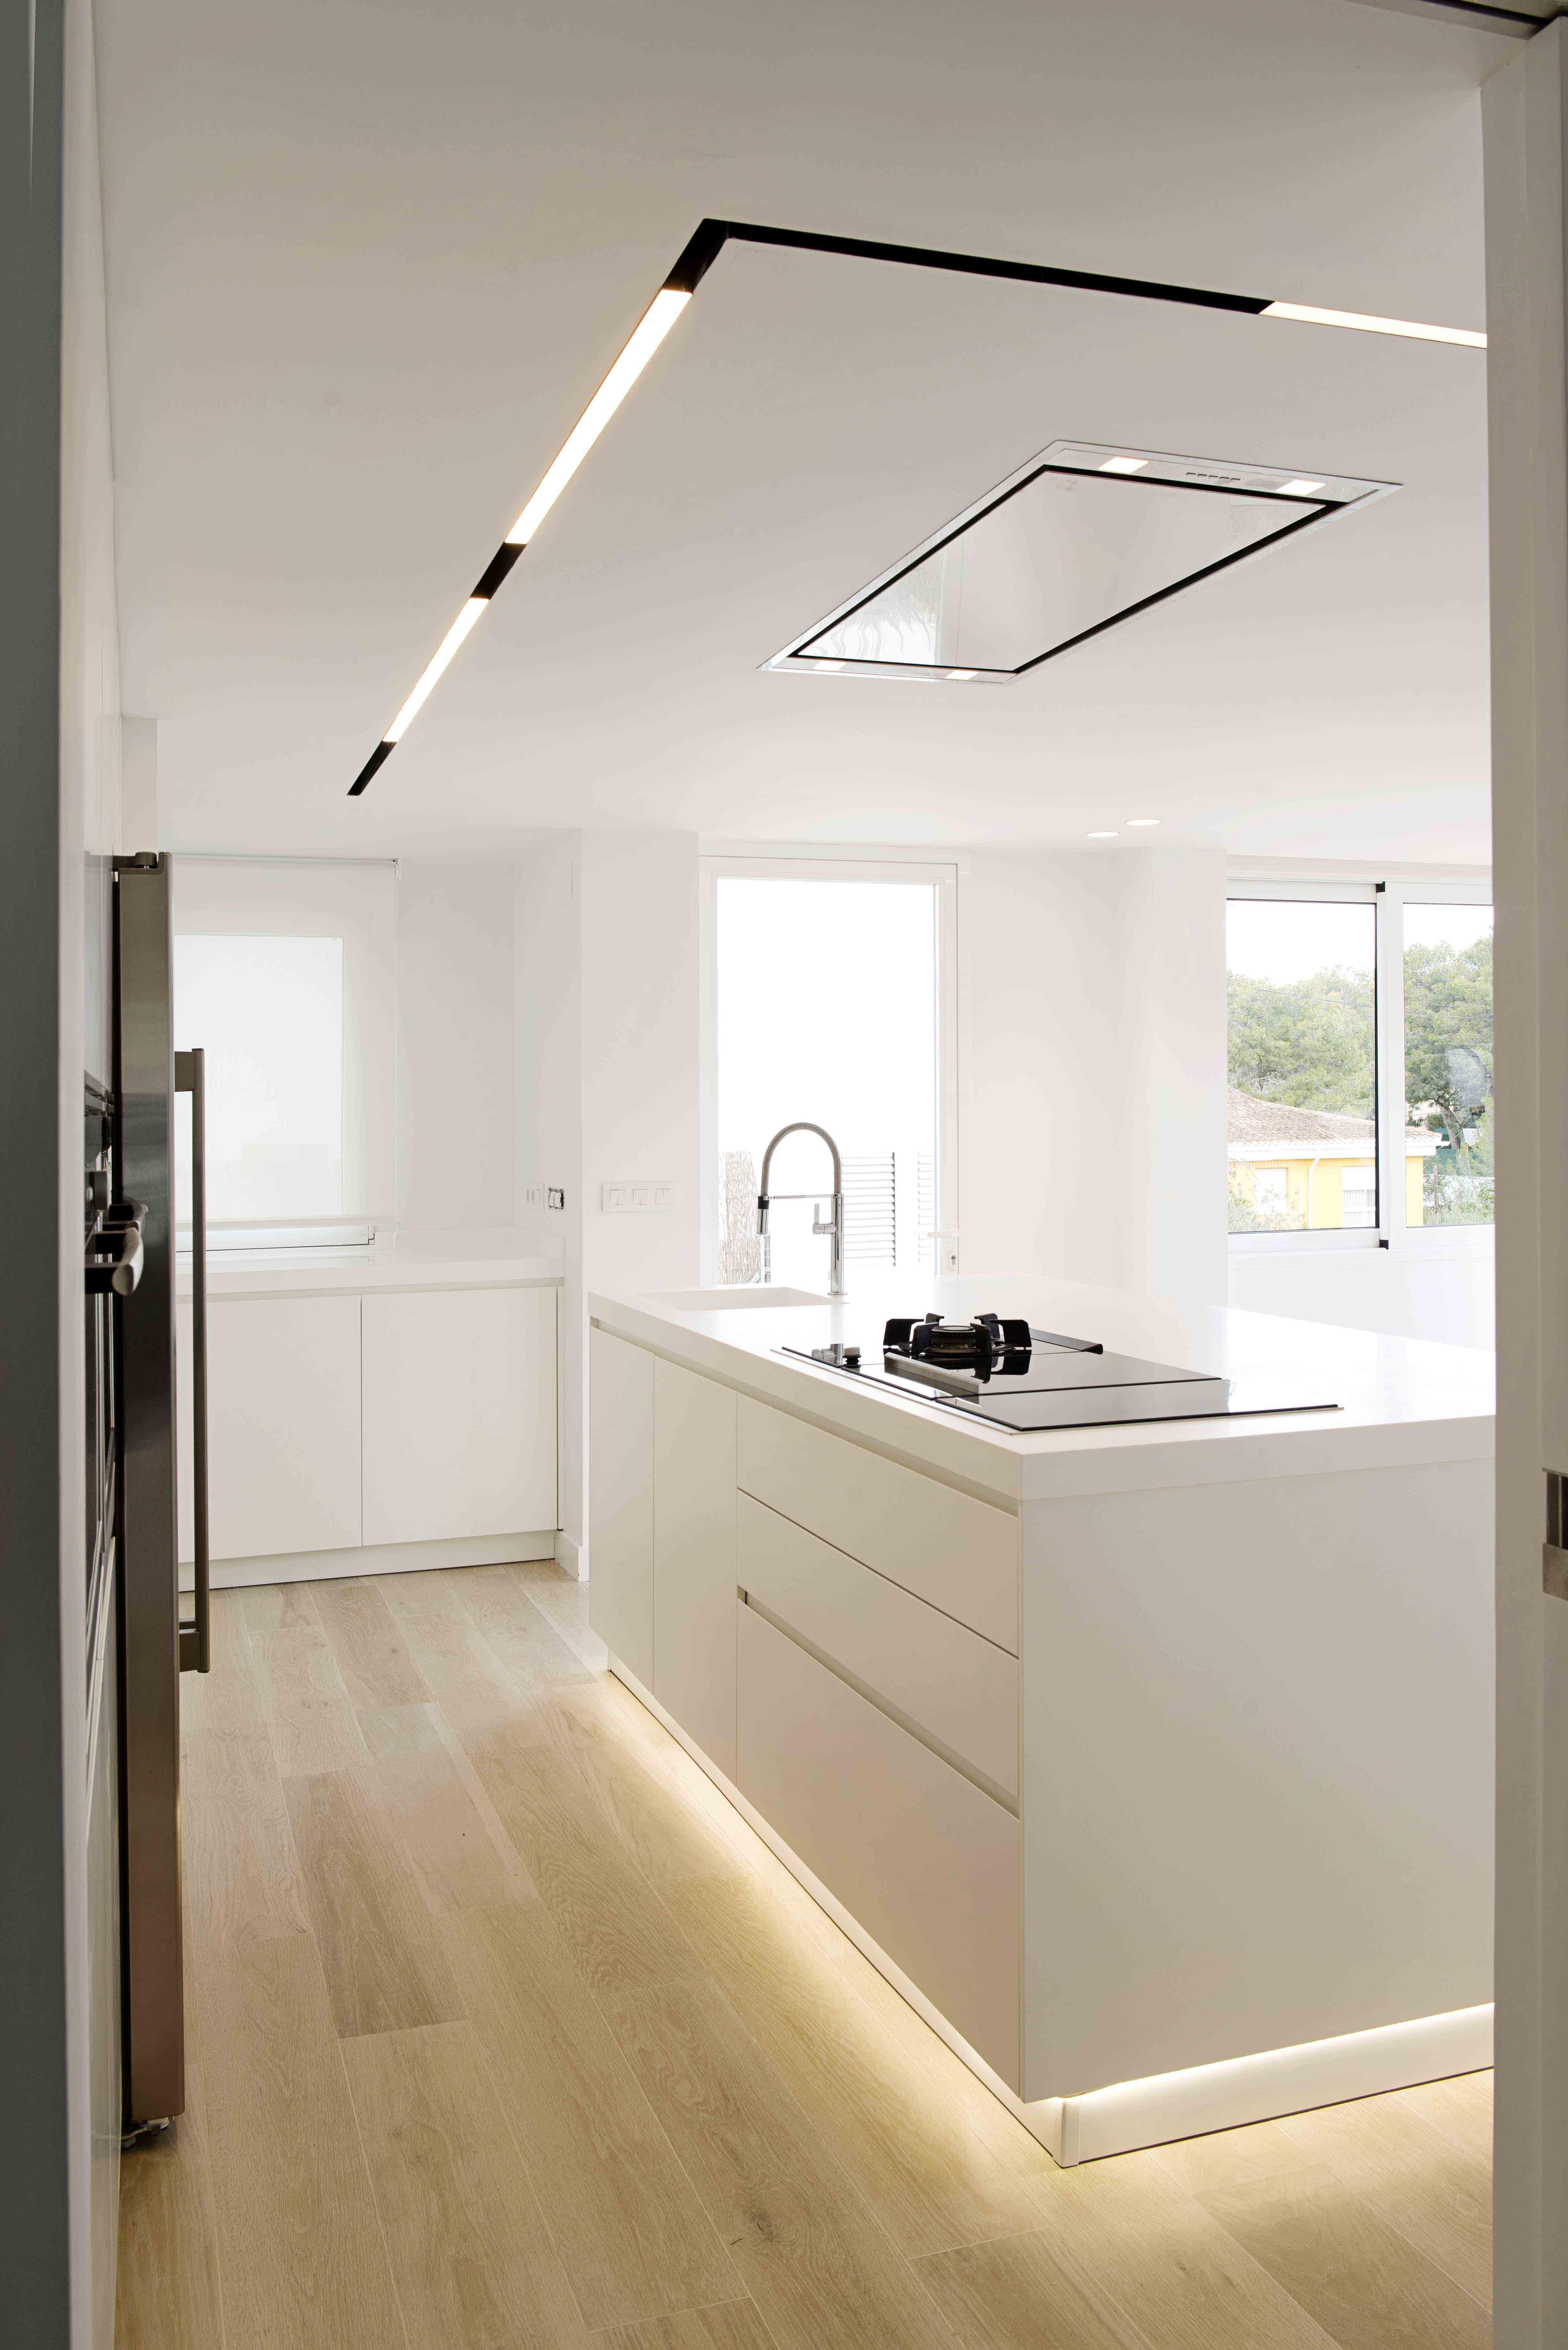 Cocina blanca con isla una moderna cocina blanca con - Suelo madera cocina ...